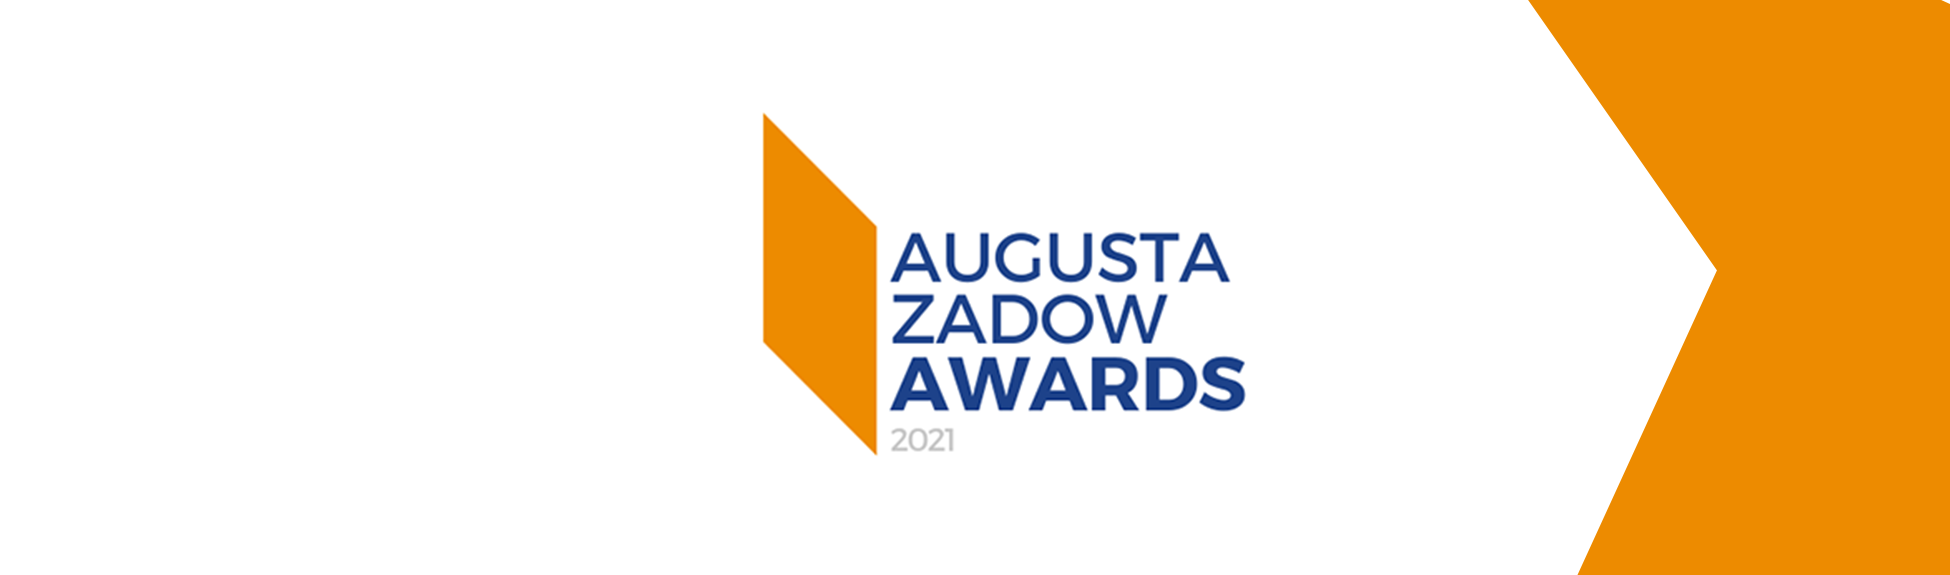 Augusta Zadow Awards winners announced